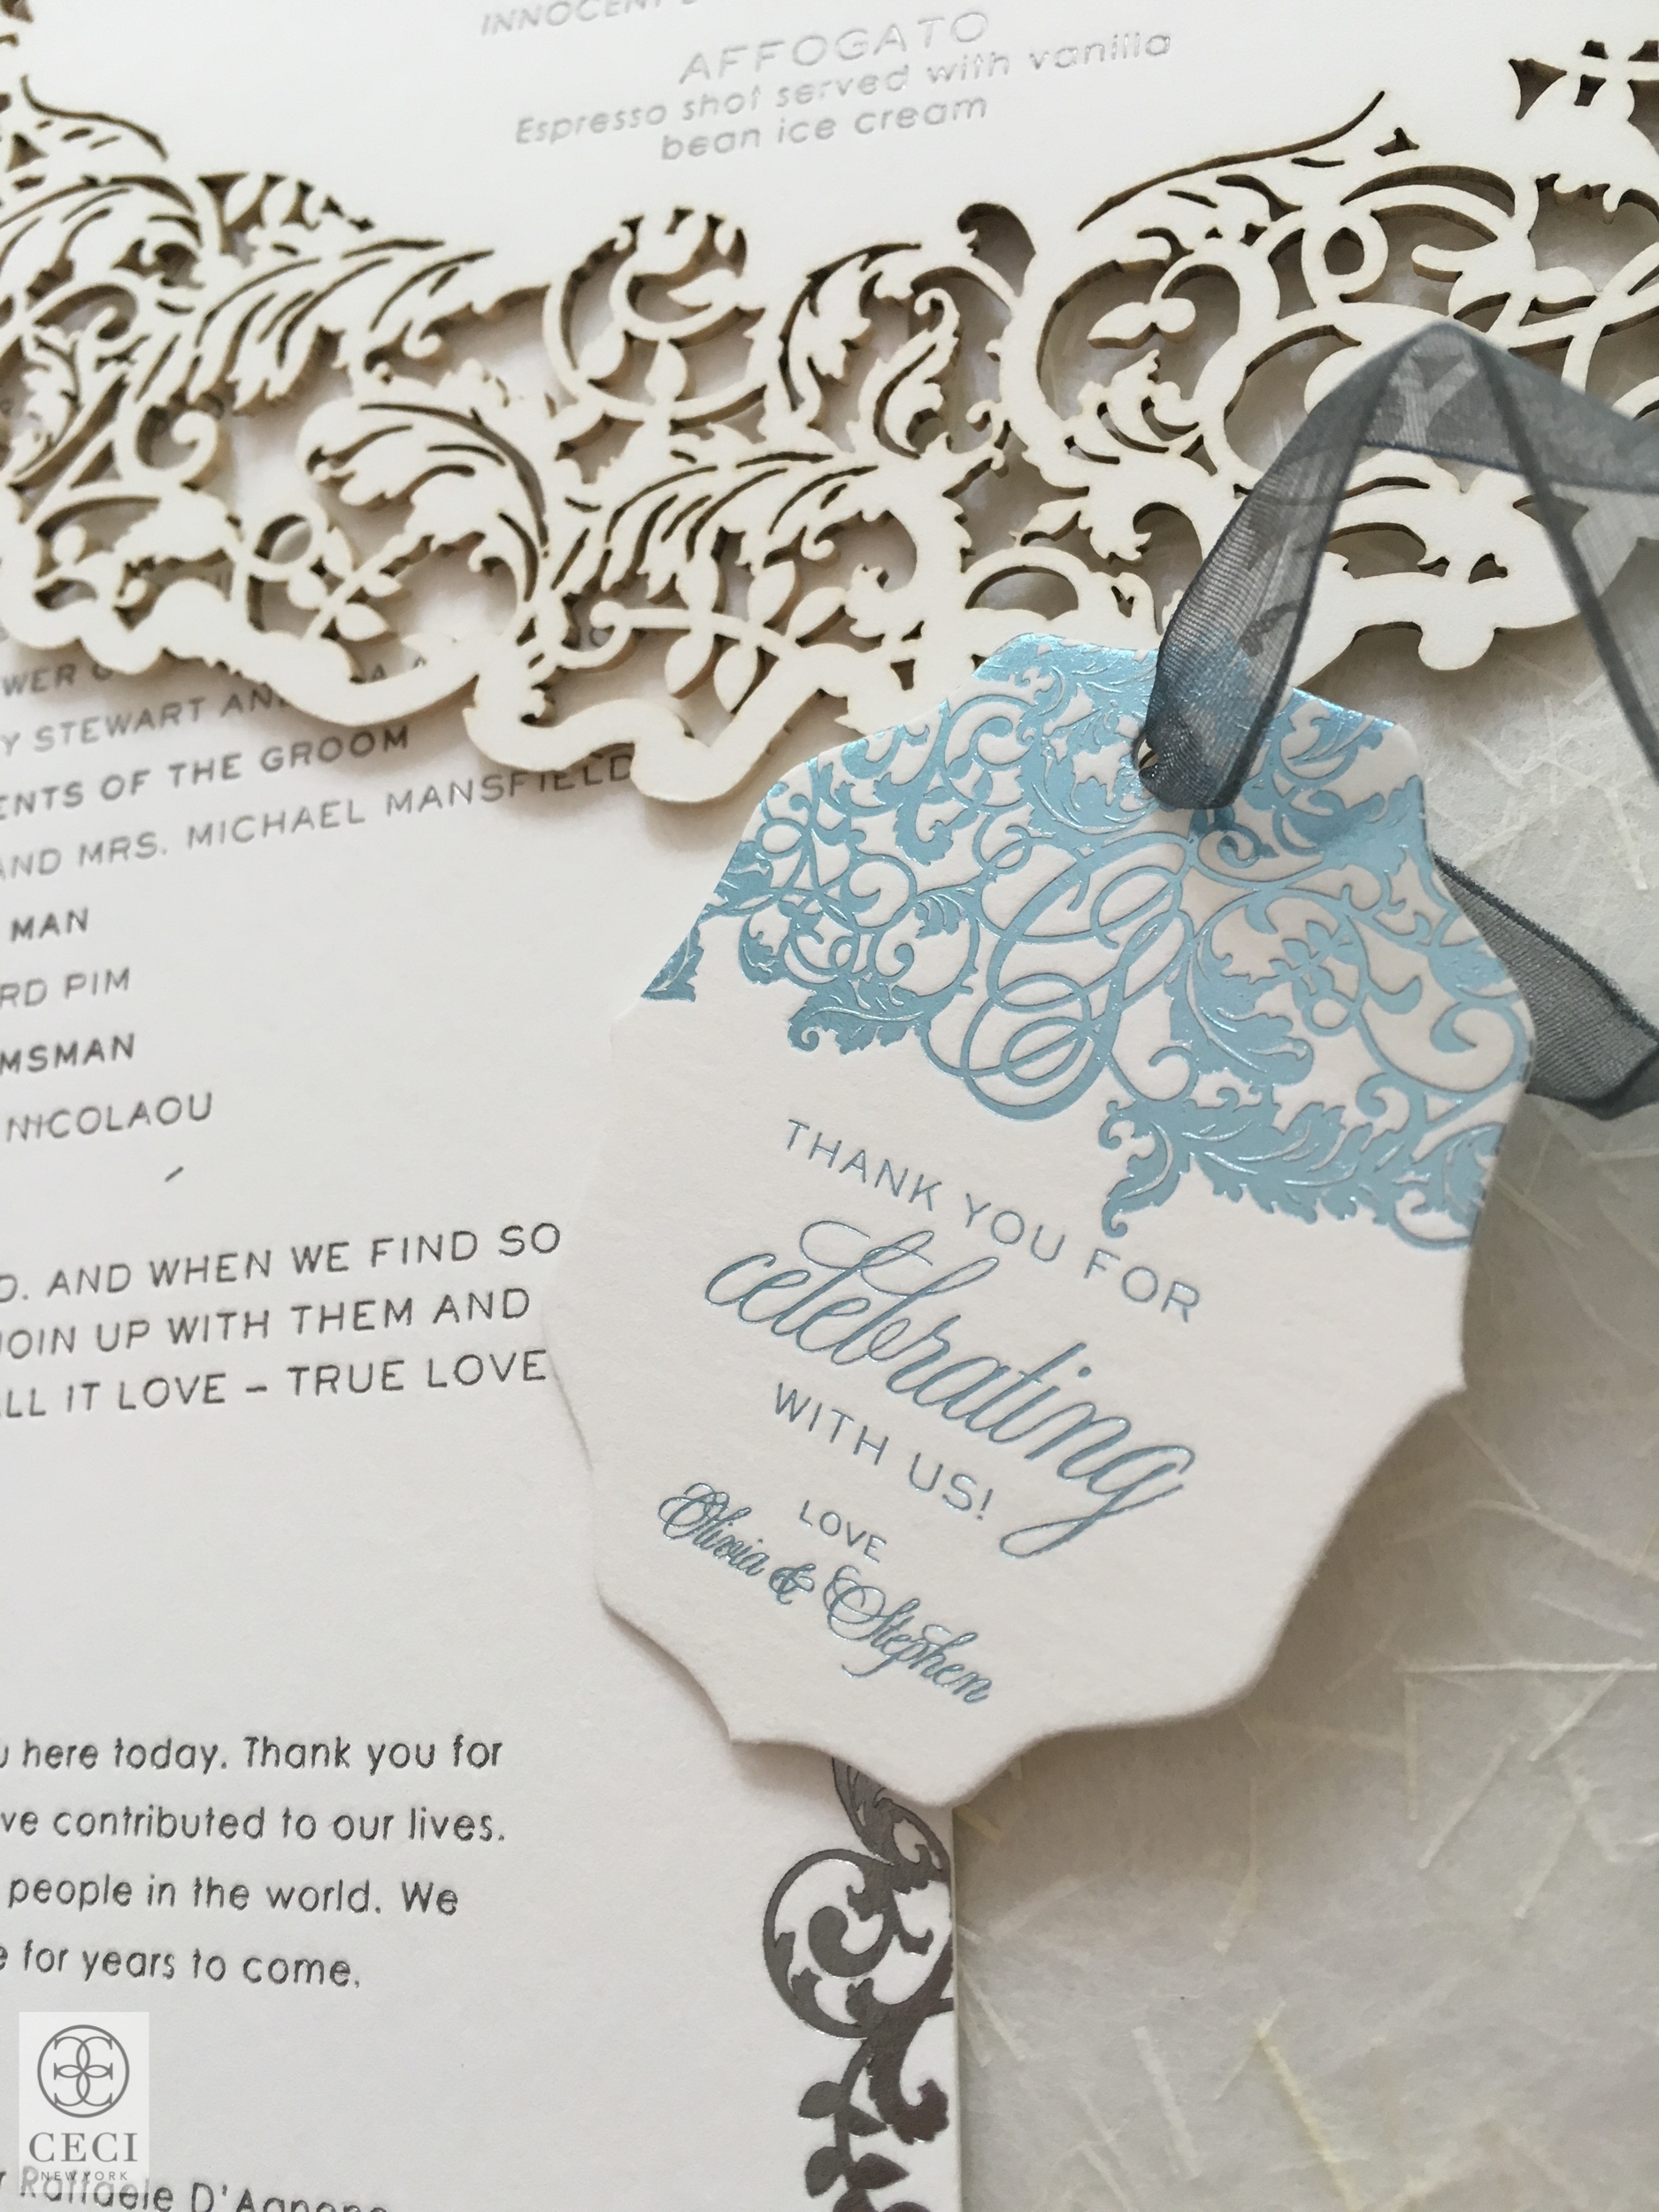 v2Ceci_New_York_Custom_Luxury_Wedding_BeautyShot_LaserCut_Stationery_Personalized_Couture_Foil_Stamping_Perth_Destination_Australia_Chic_-4.jpg